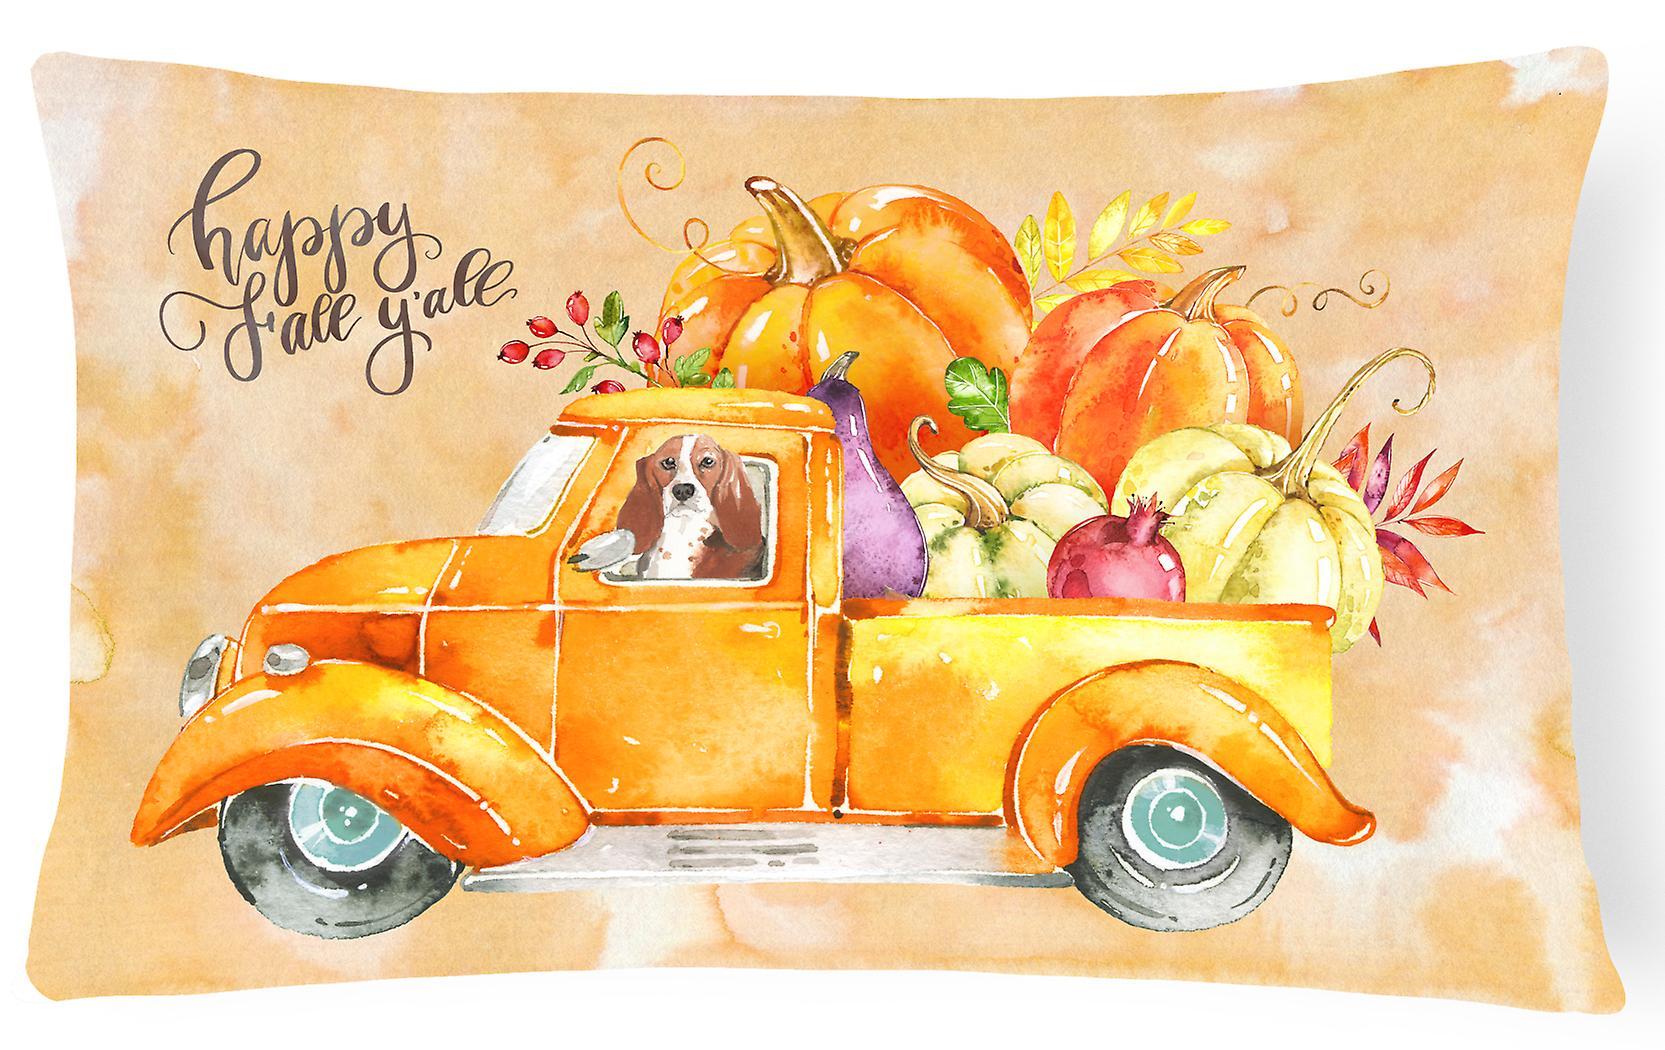 Harvest Canvas Basset Decorative Fall Fabric Hound Pillow gf67Yby